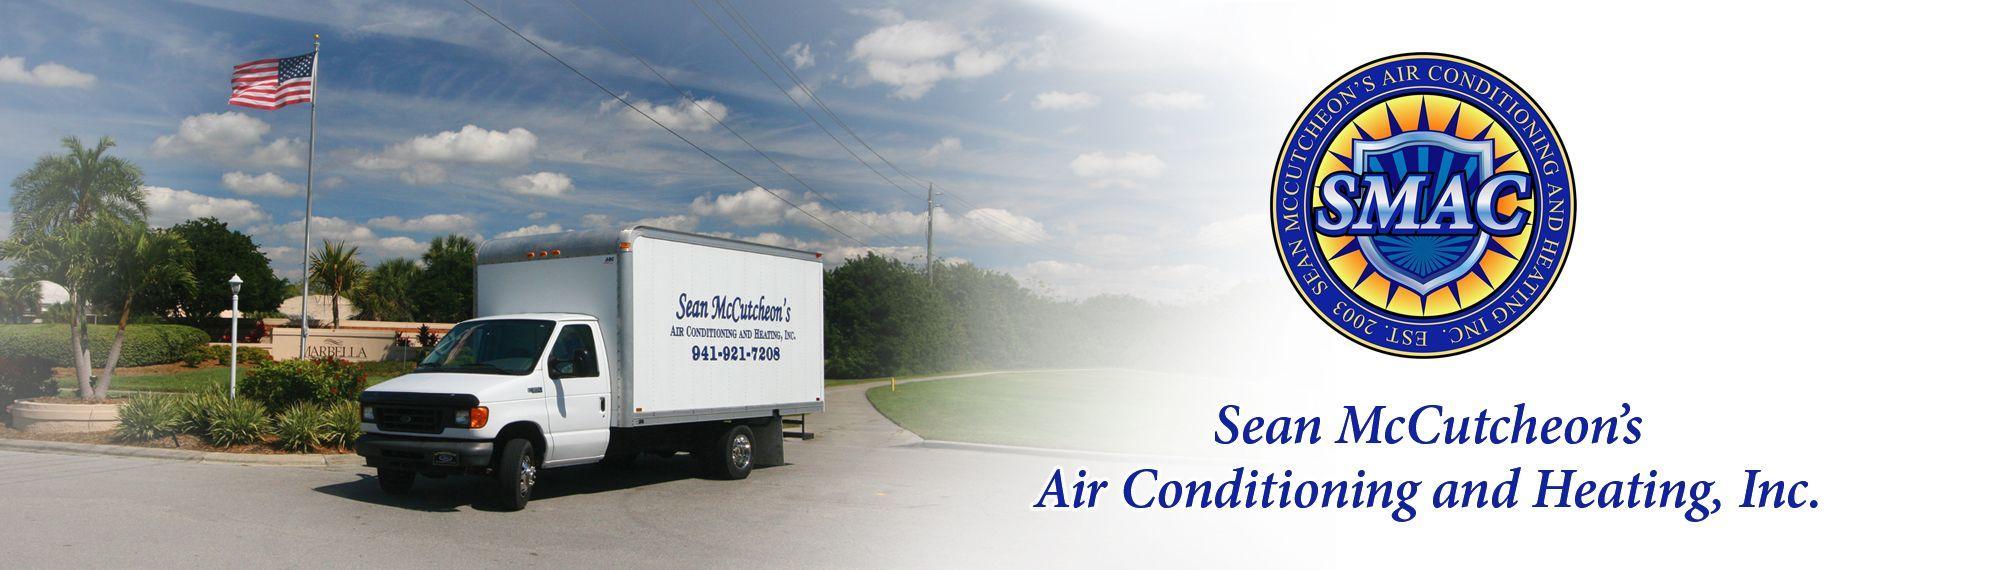 Sean McCutcheon's Air Conditioning and Heating Sarasota Florida